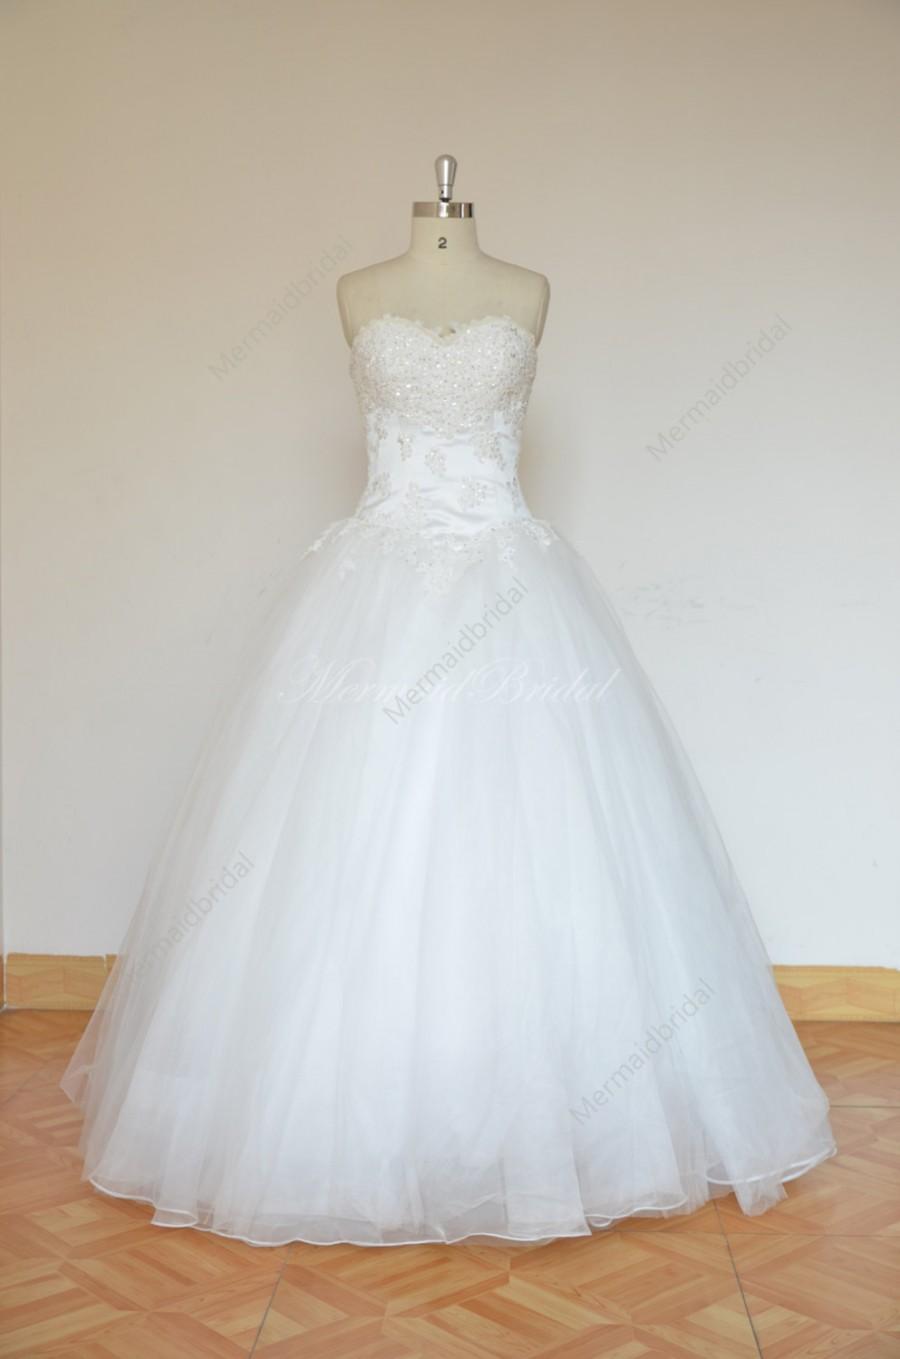 Mariage - Romantic Ivory ball gown wedding dress with elegant beading work